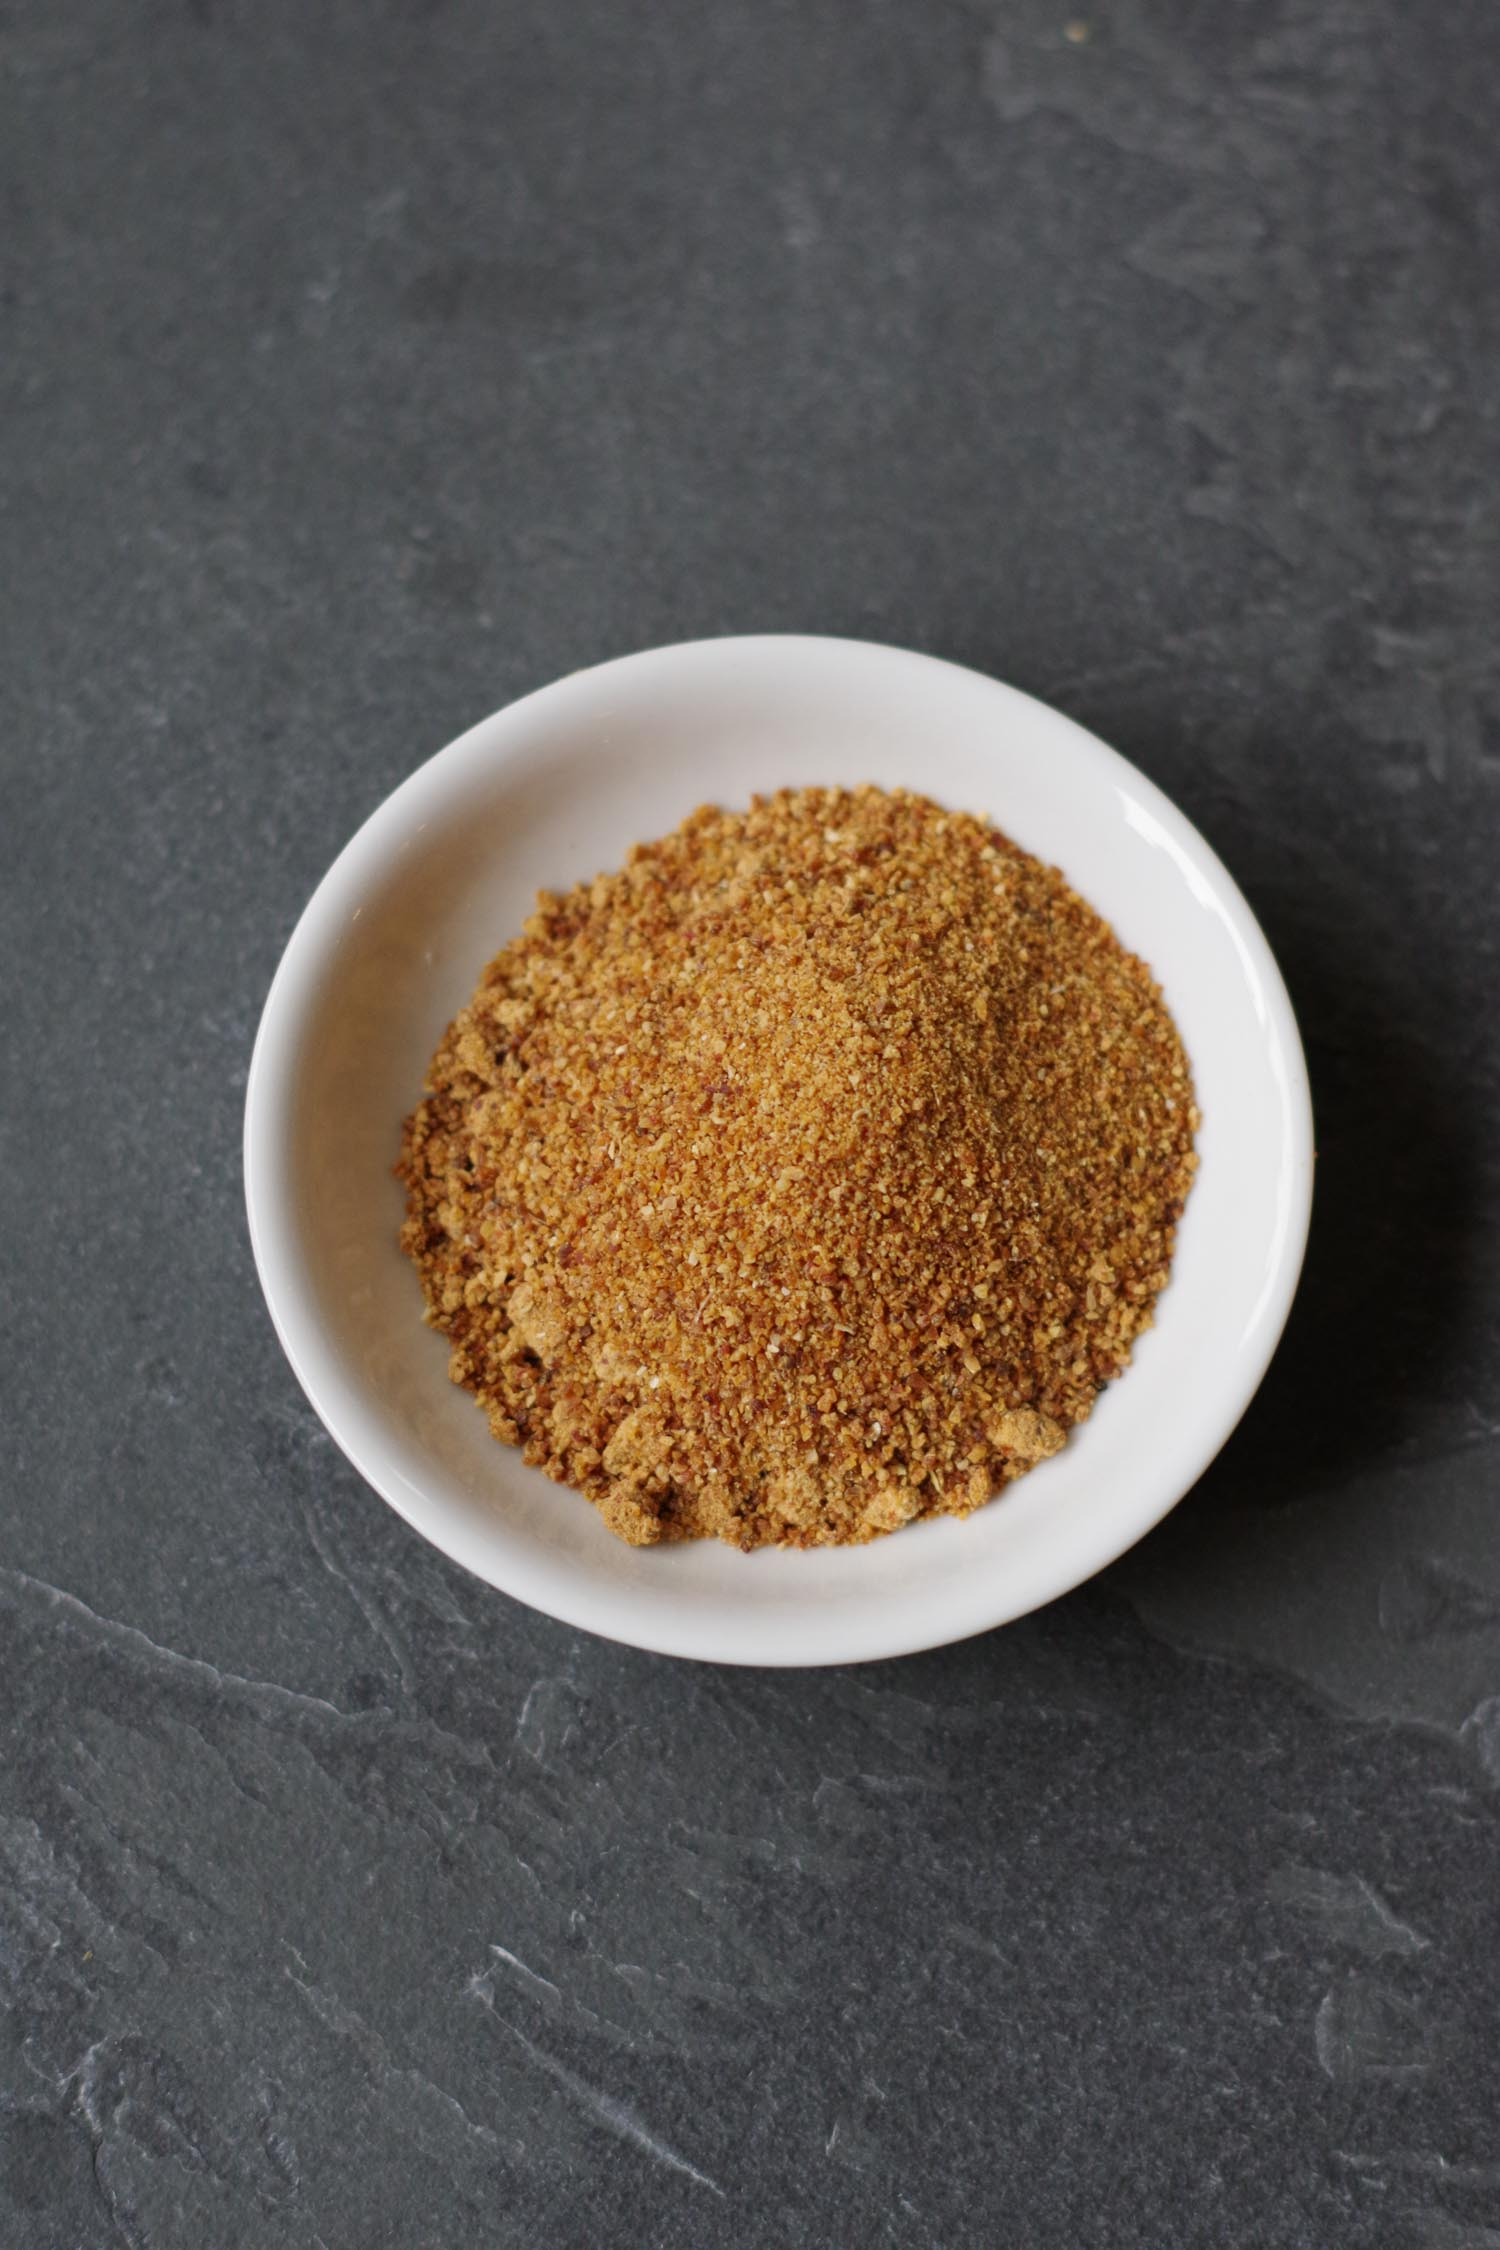 Date sugar to replace powdered sugar